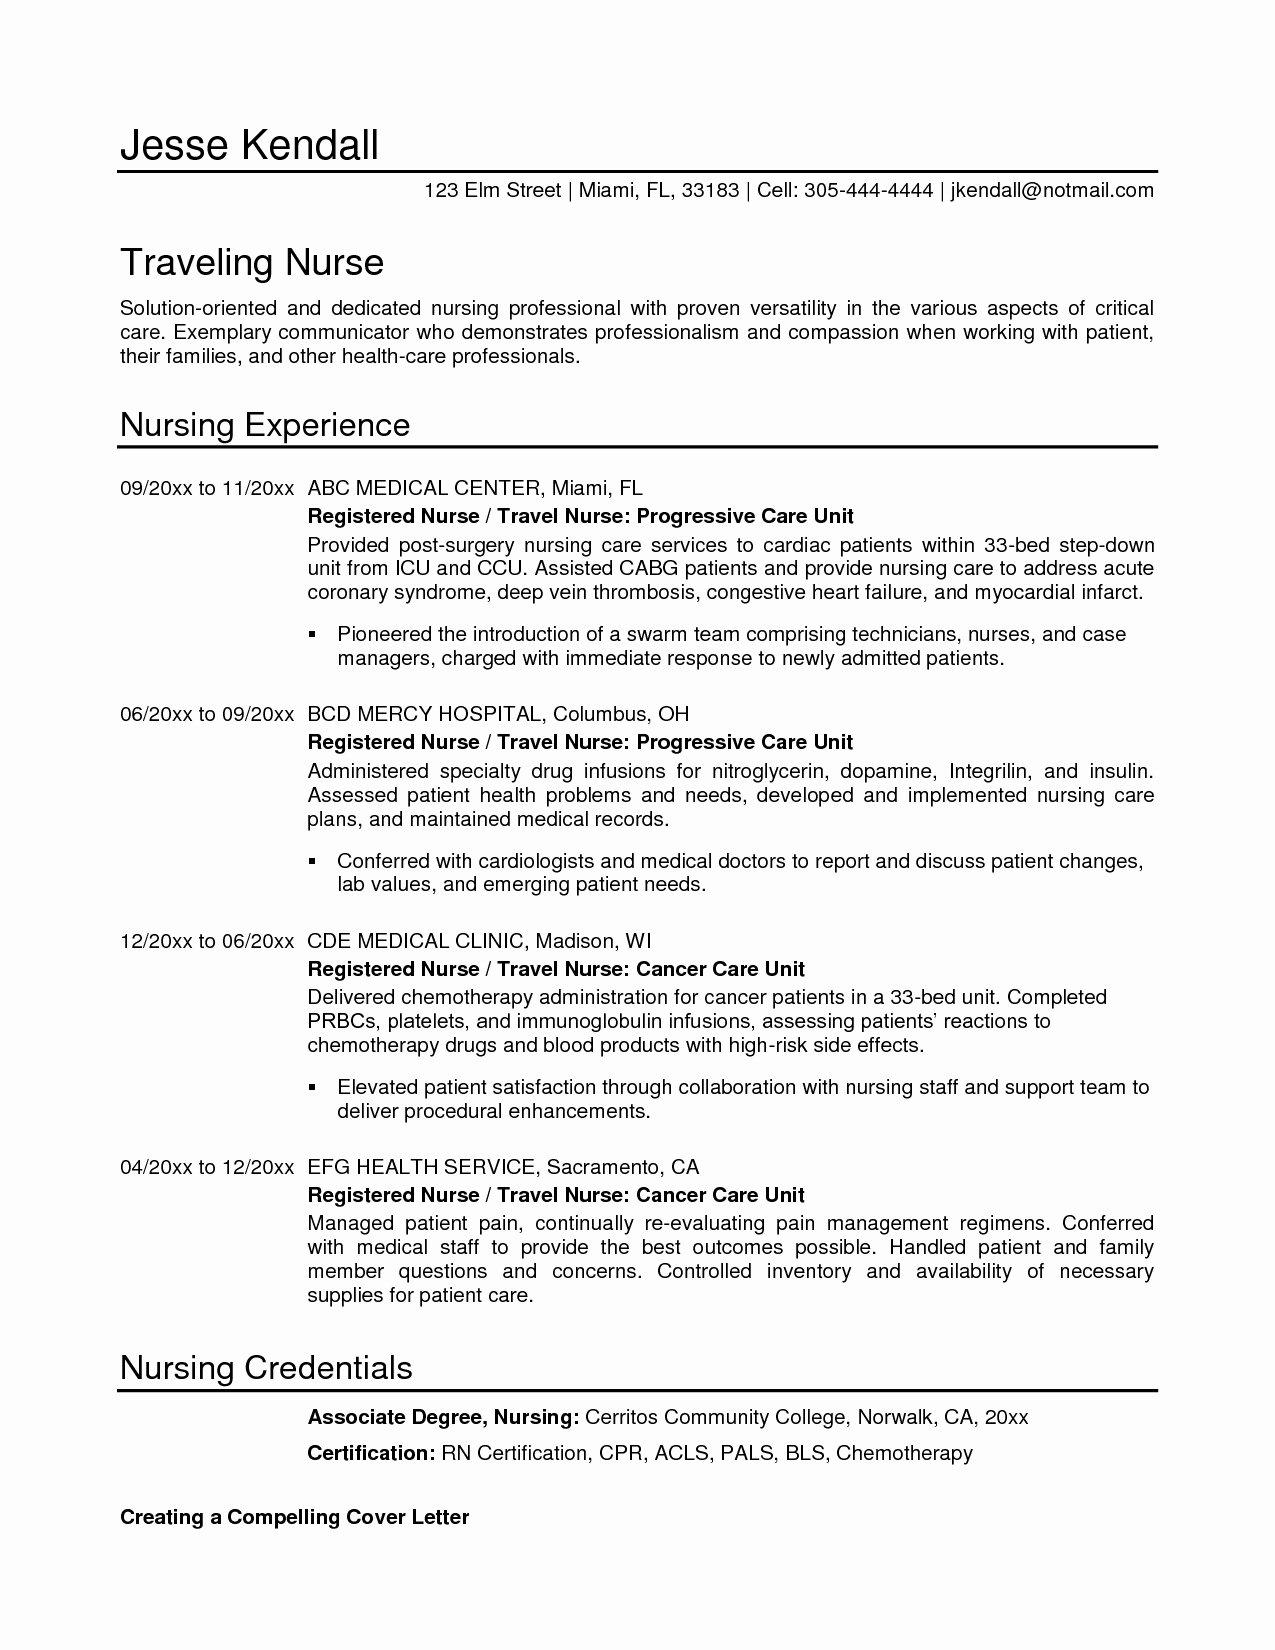 Resume Templates for Nursing New Graduates